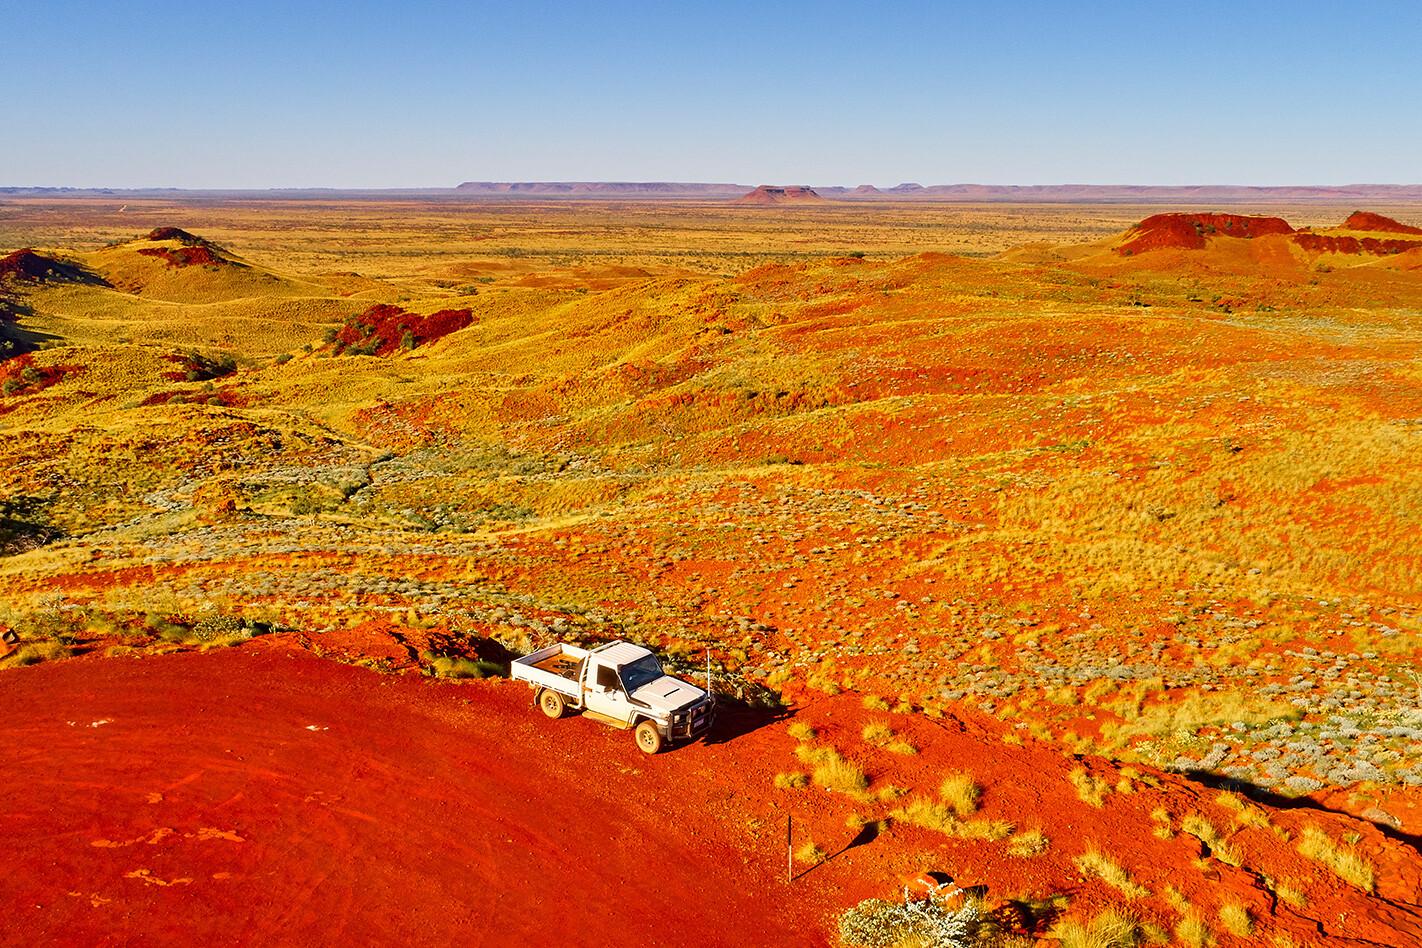 Western Australia Pilbara region